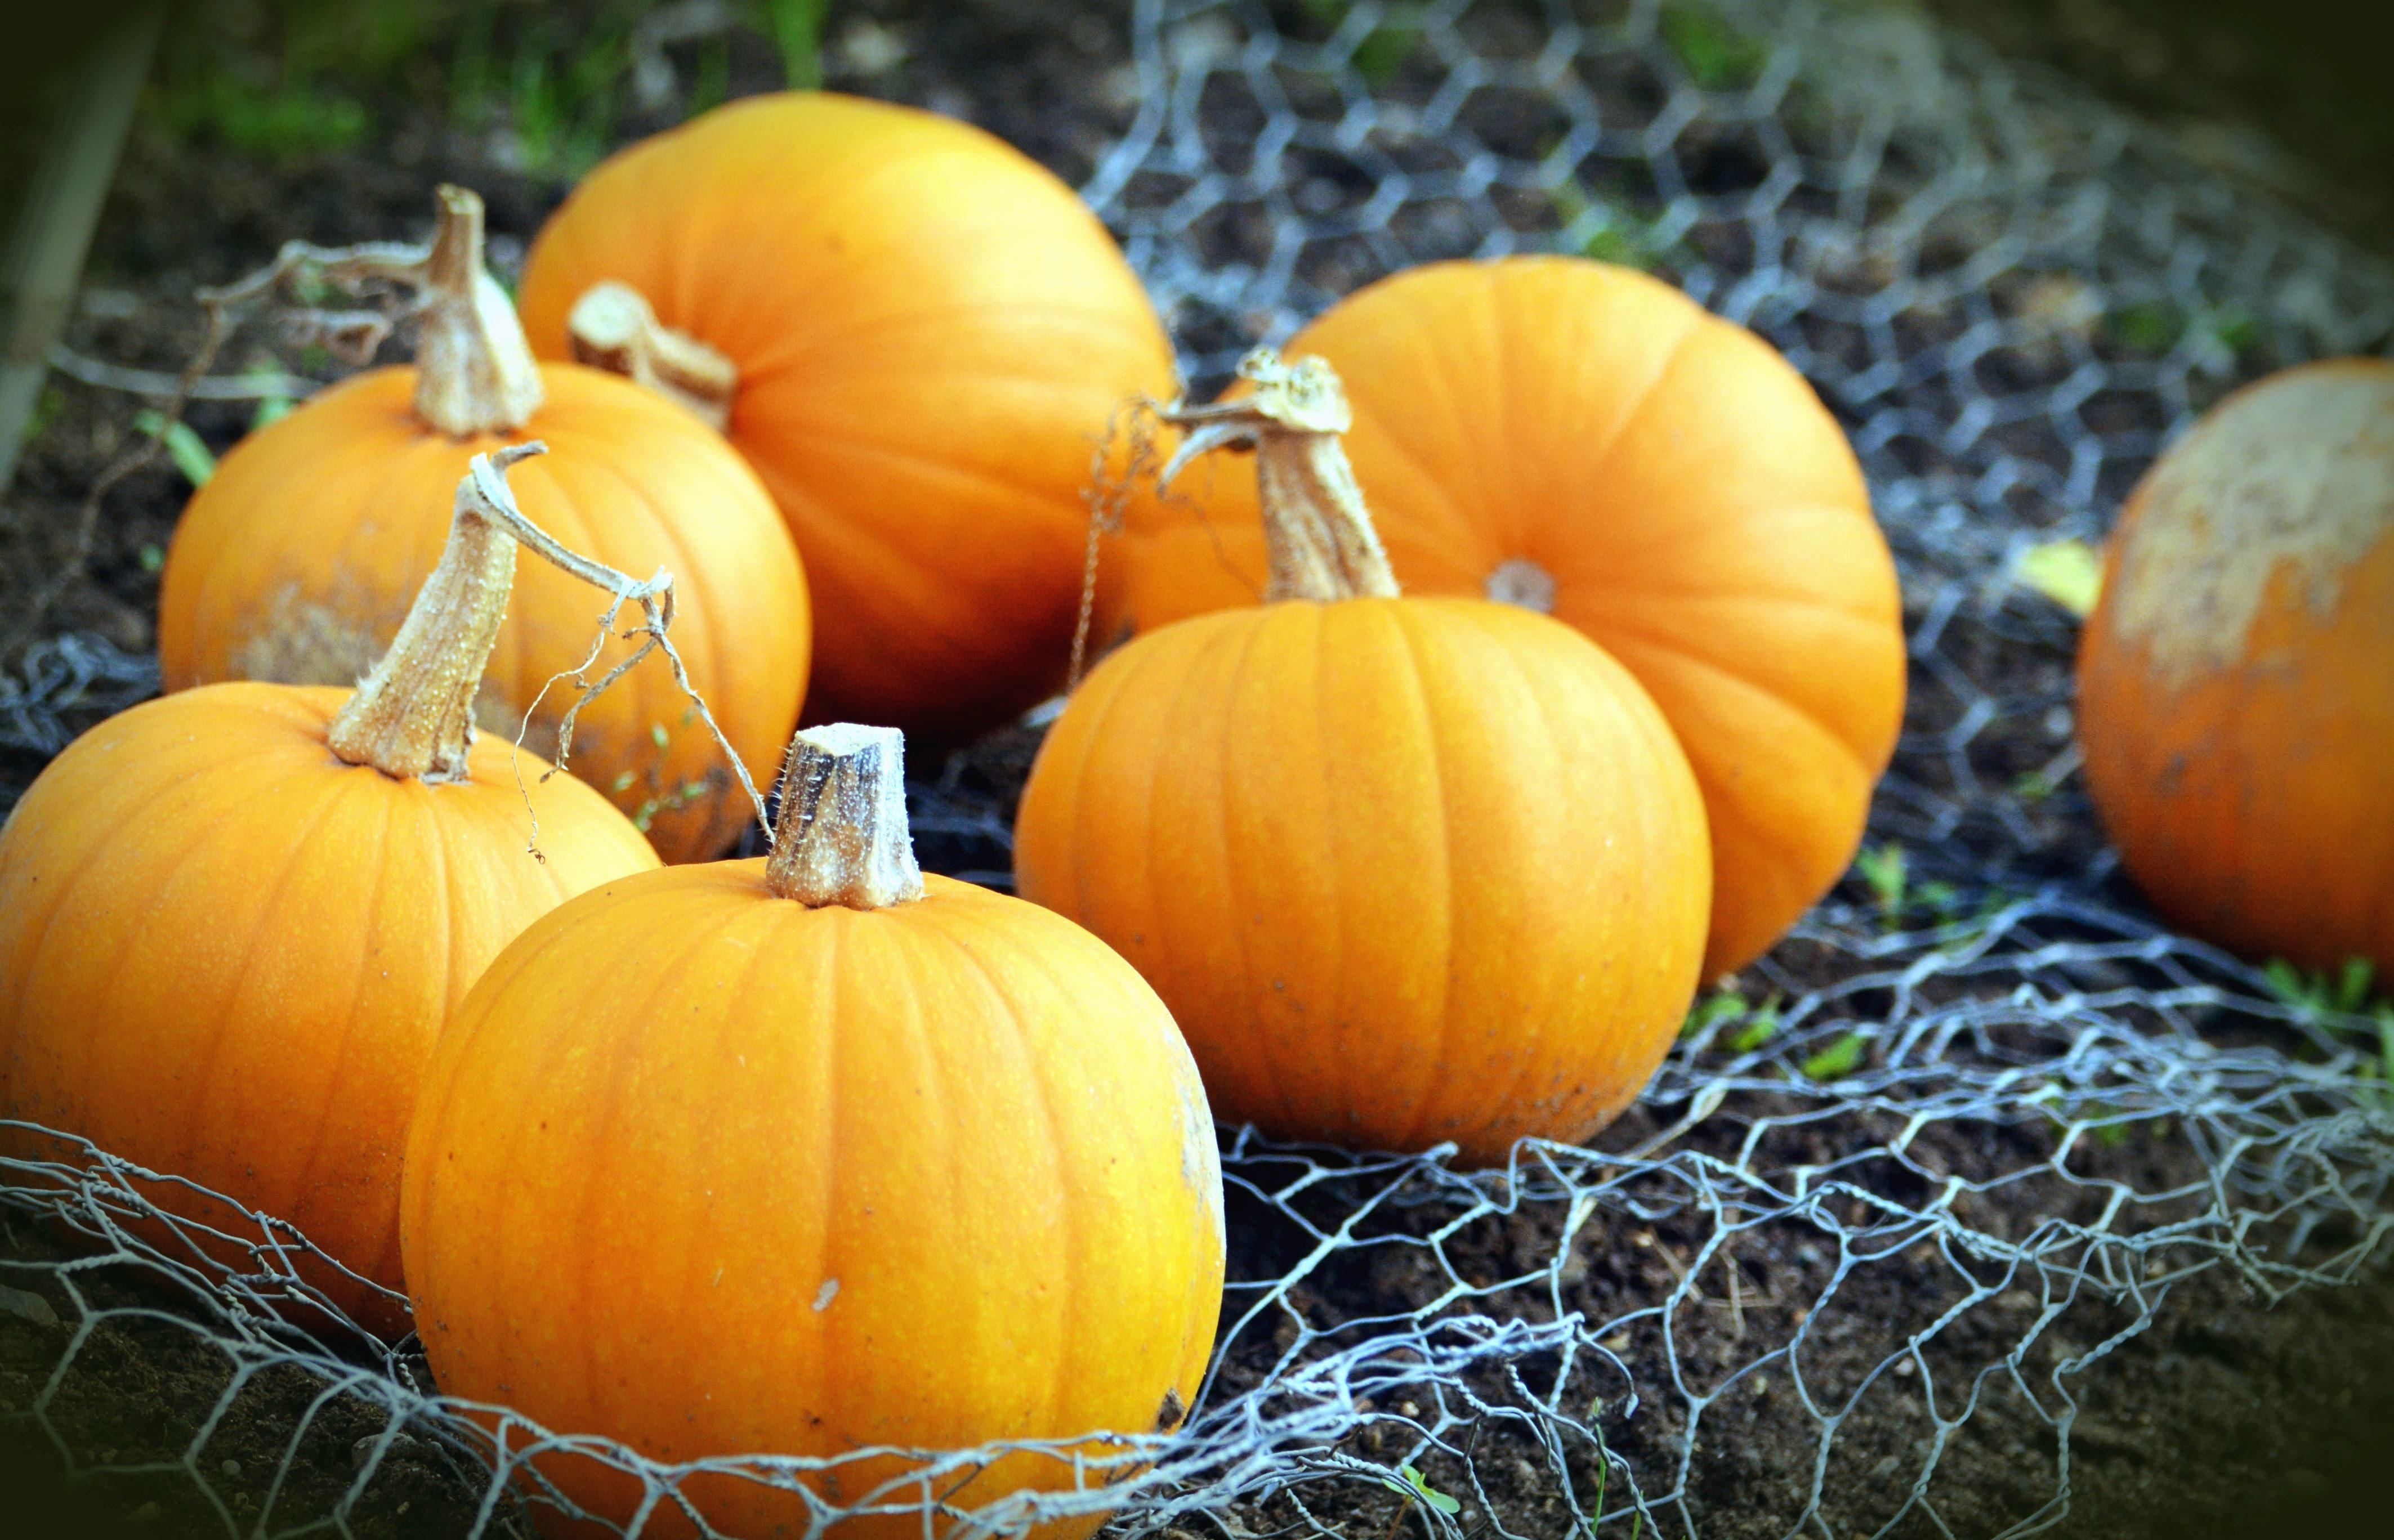 free picture pumpkin vegetable plant autumn network